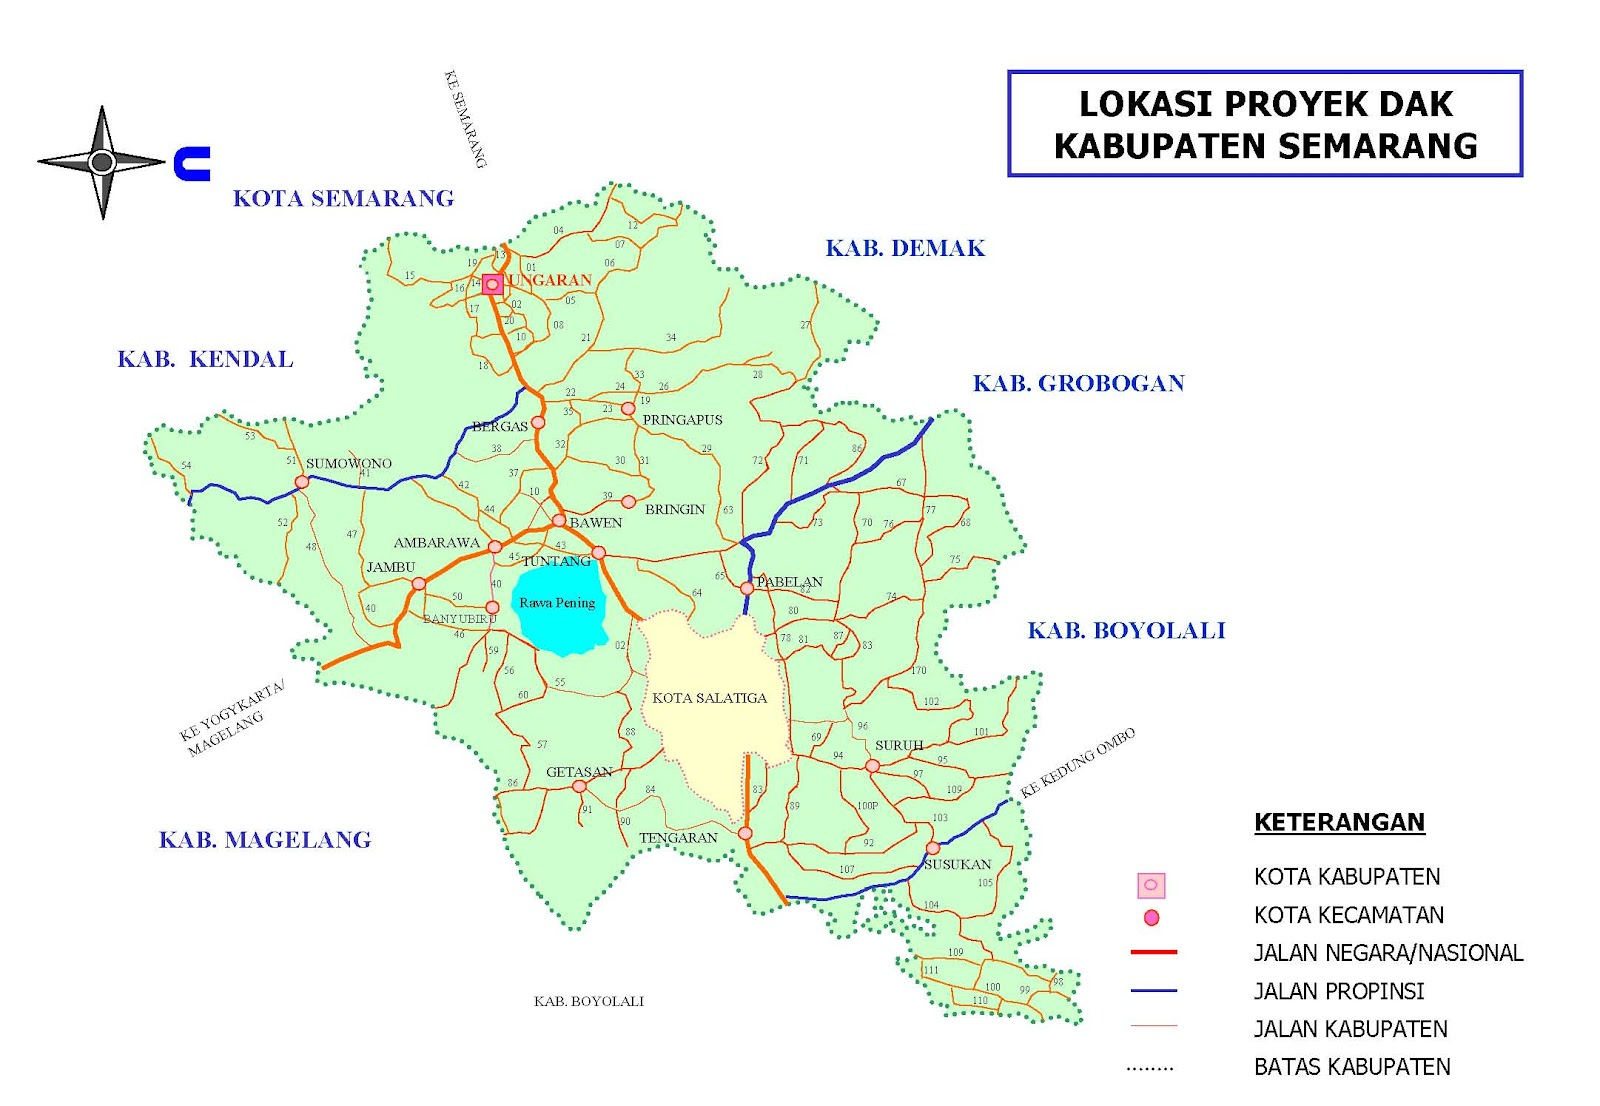 Peta Kota Kabupaten Semarang Museum Kereta Api Ambarawa Kab